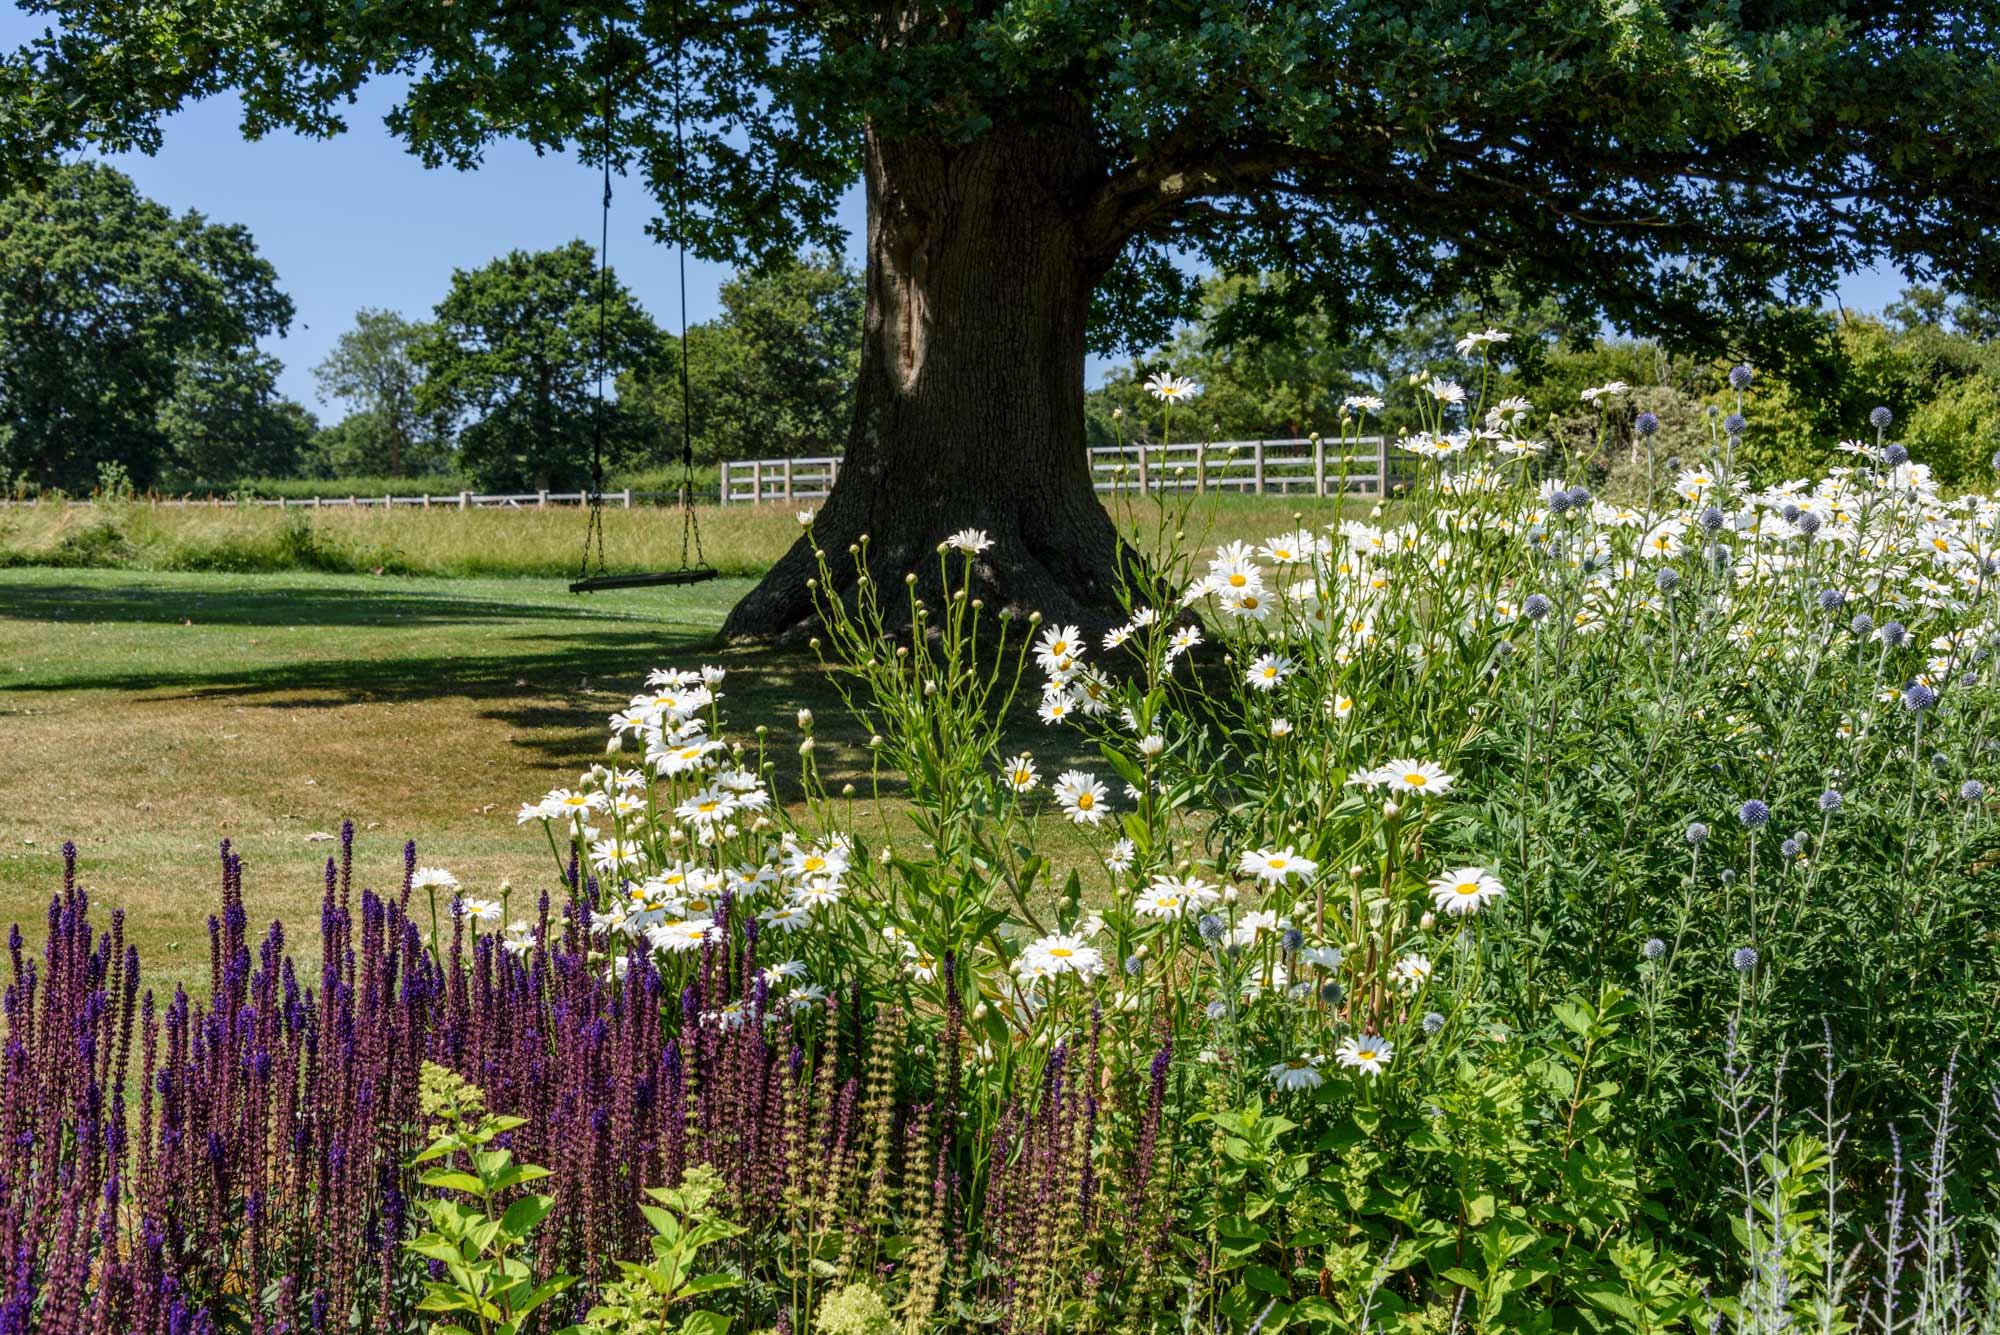 Andy Scott photography gardens 01